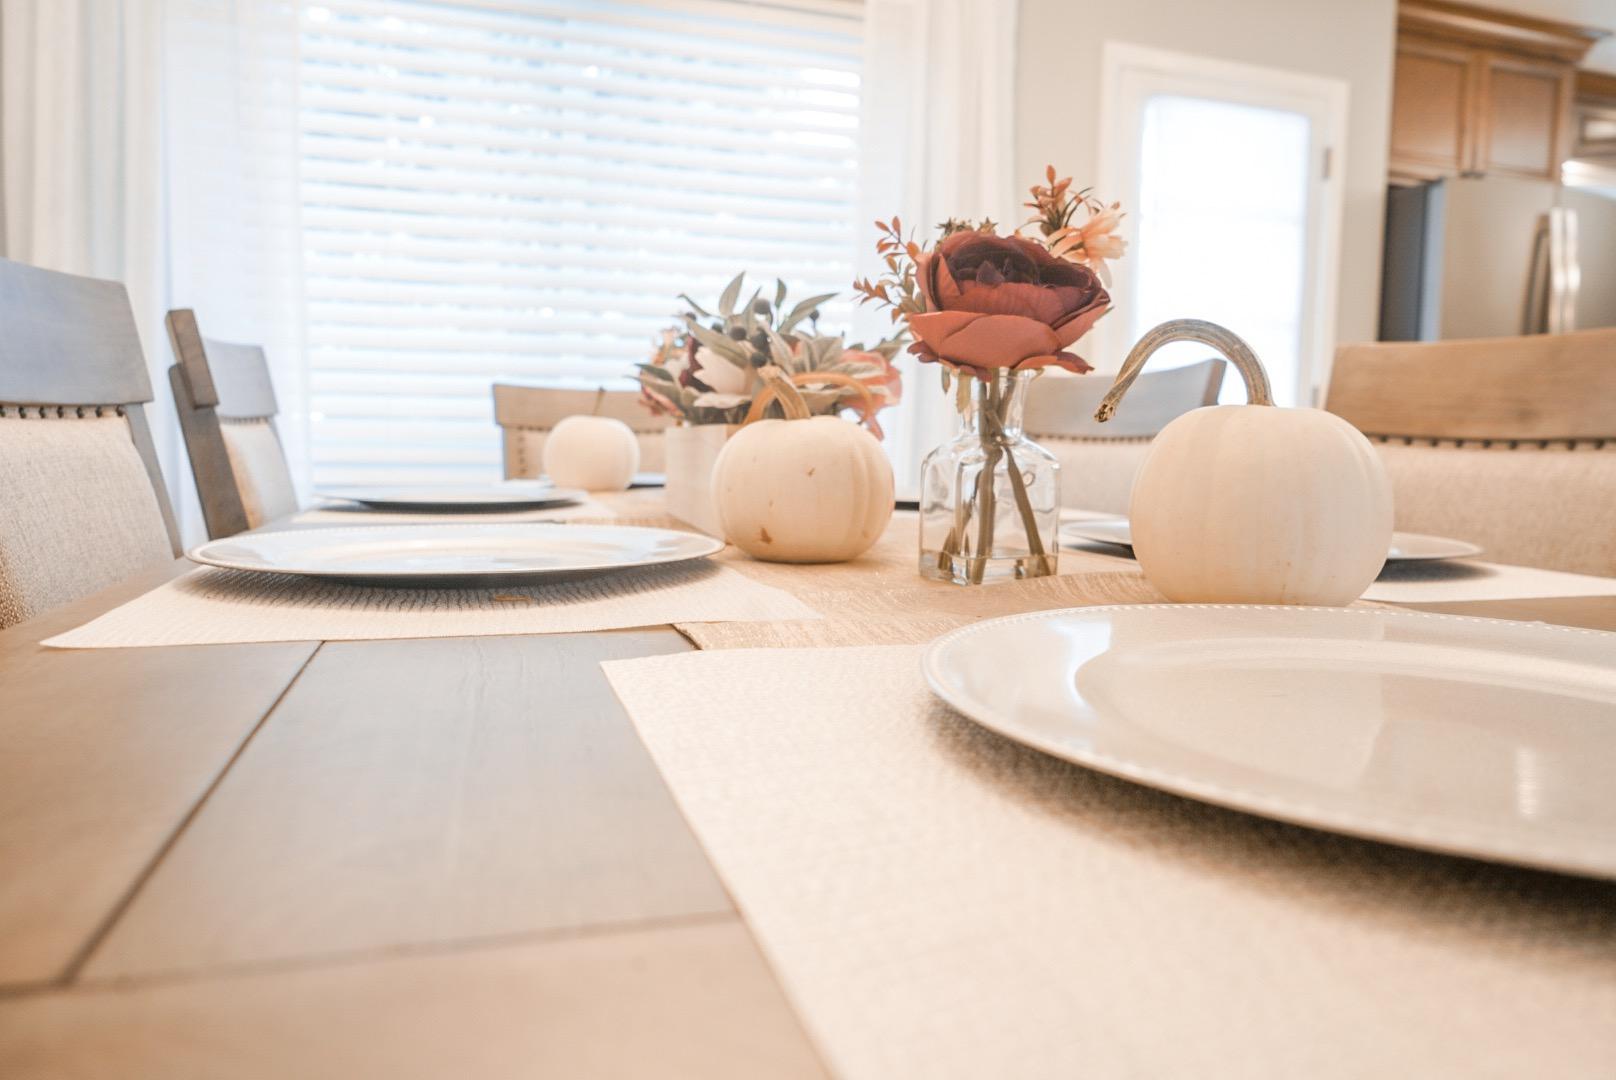 Thanksgiving Table Design for Under $50